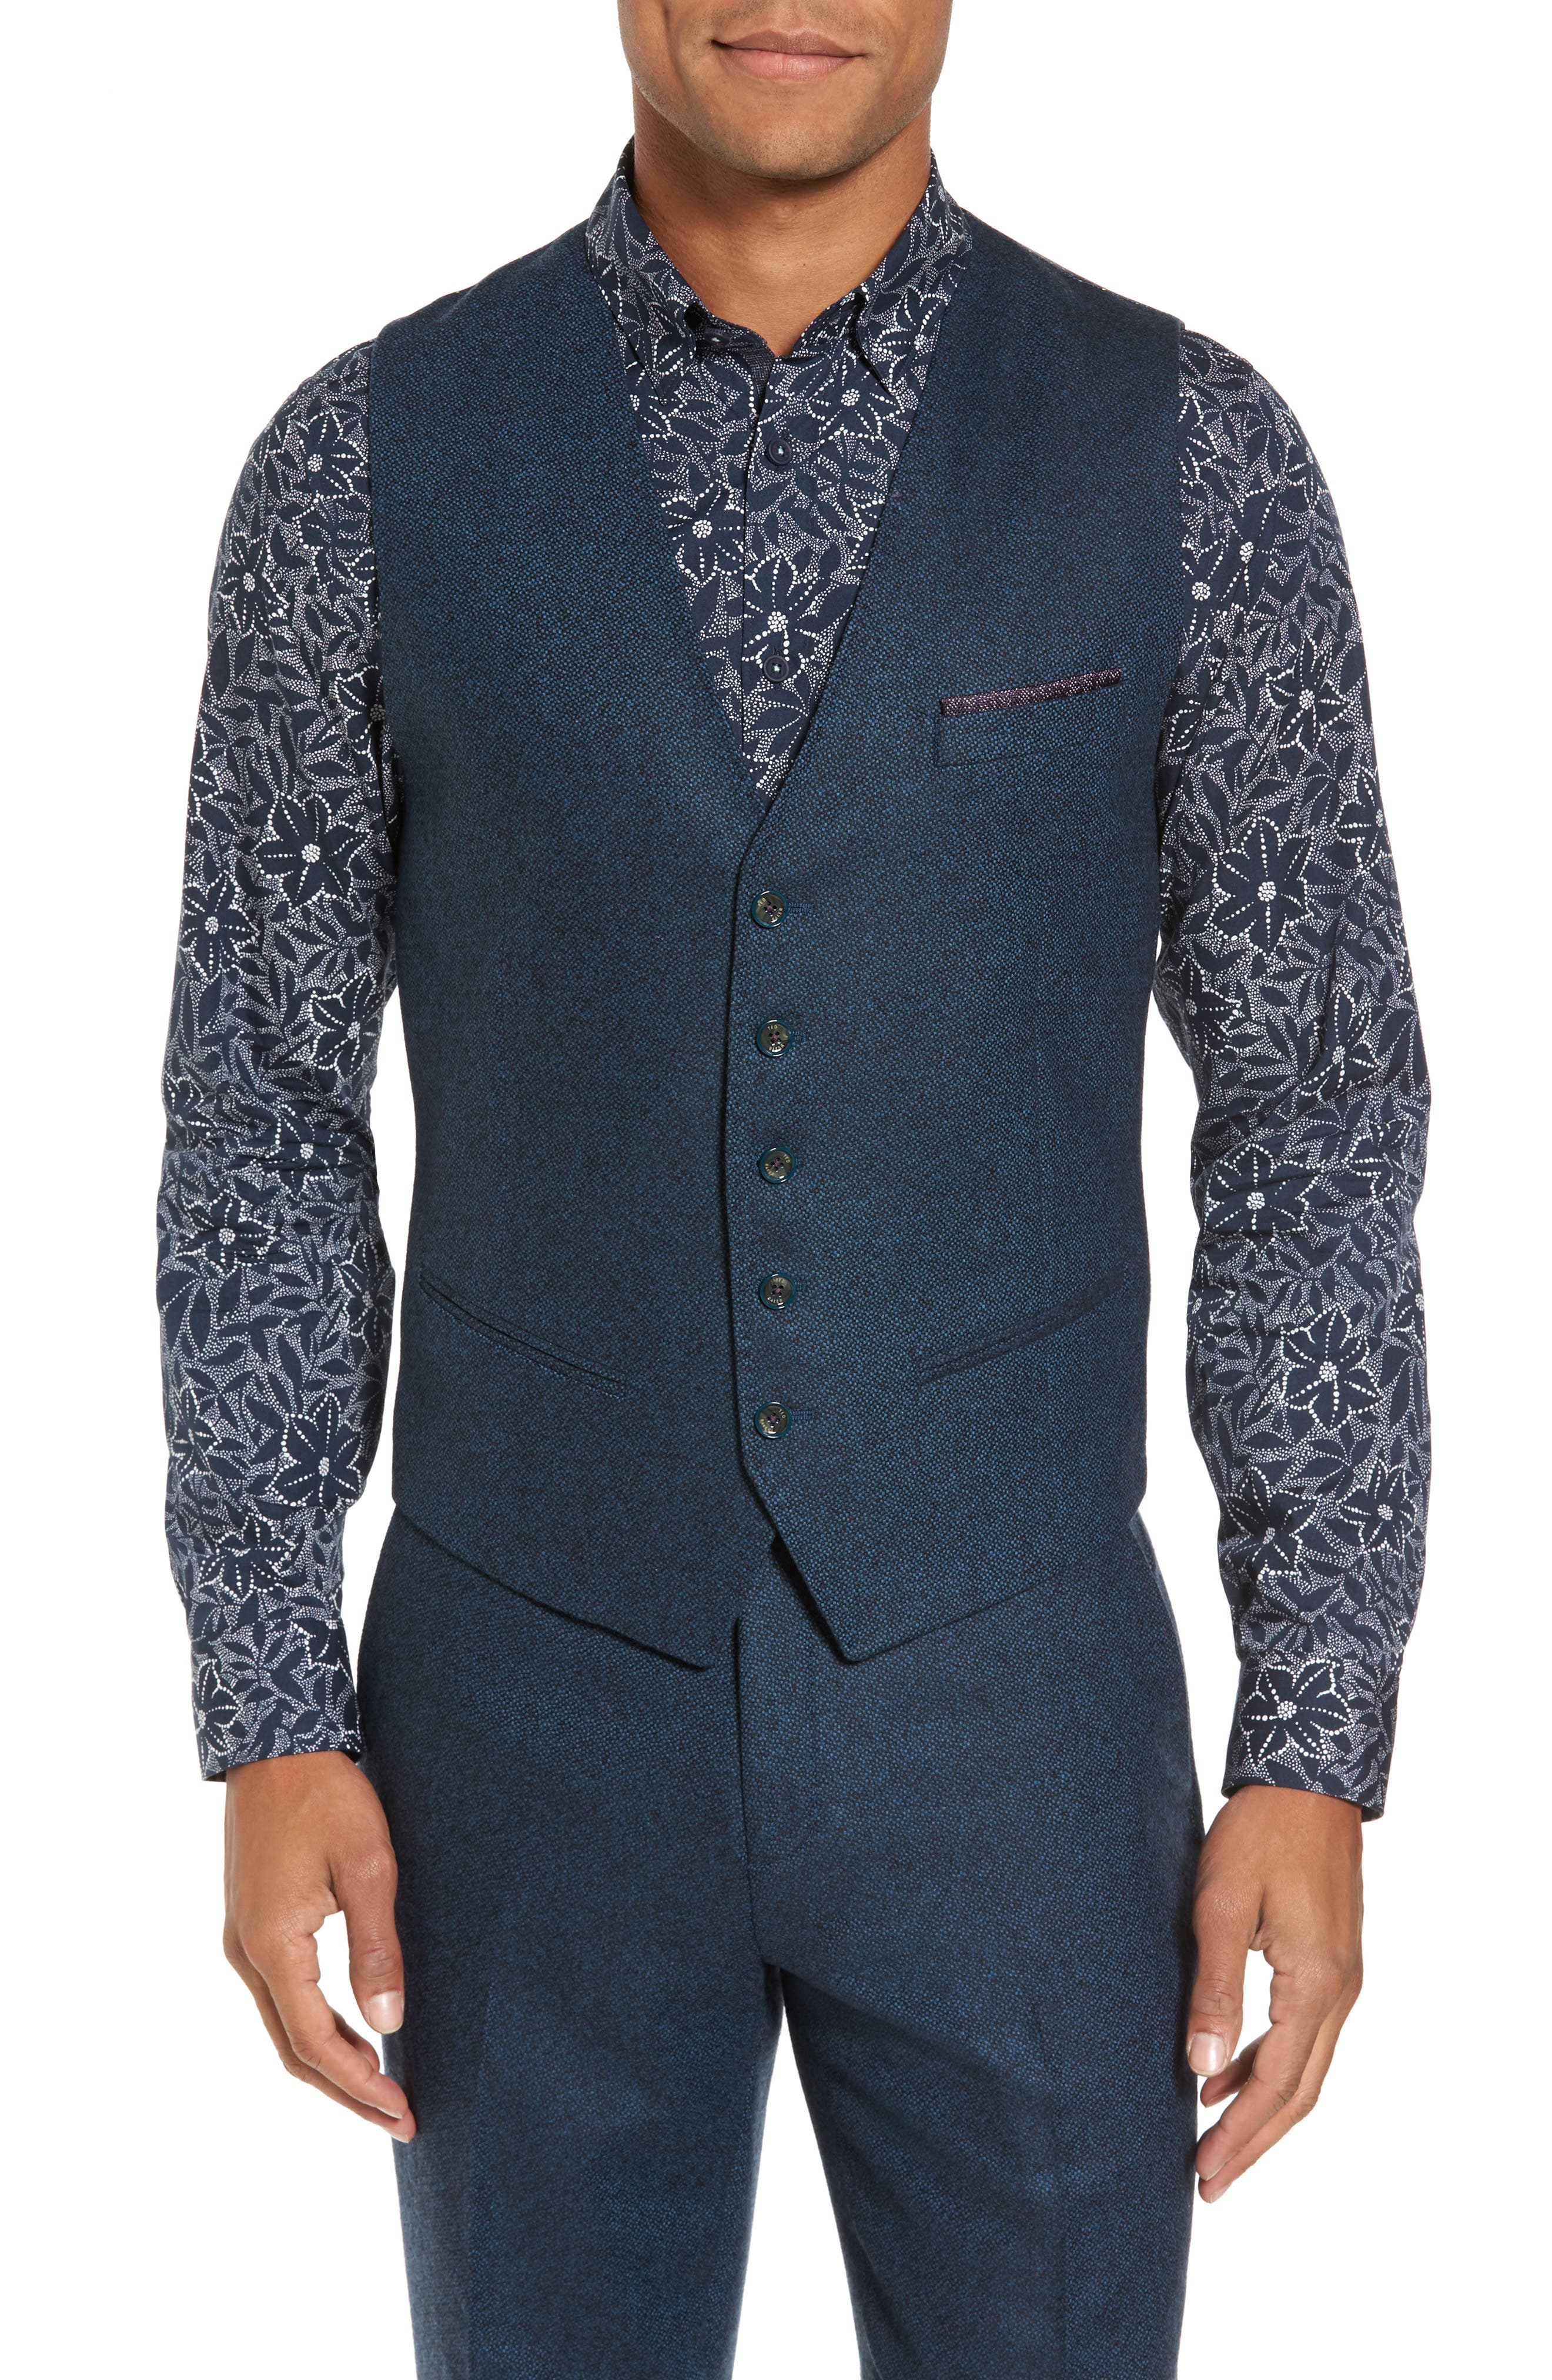 Modern Slim Fit Waistcoat,                             Main thumbnail 1, color,                             460